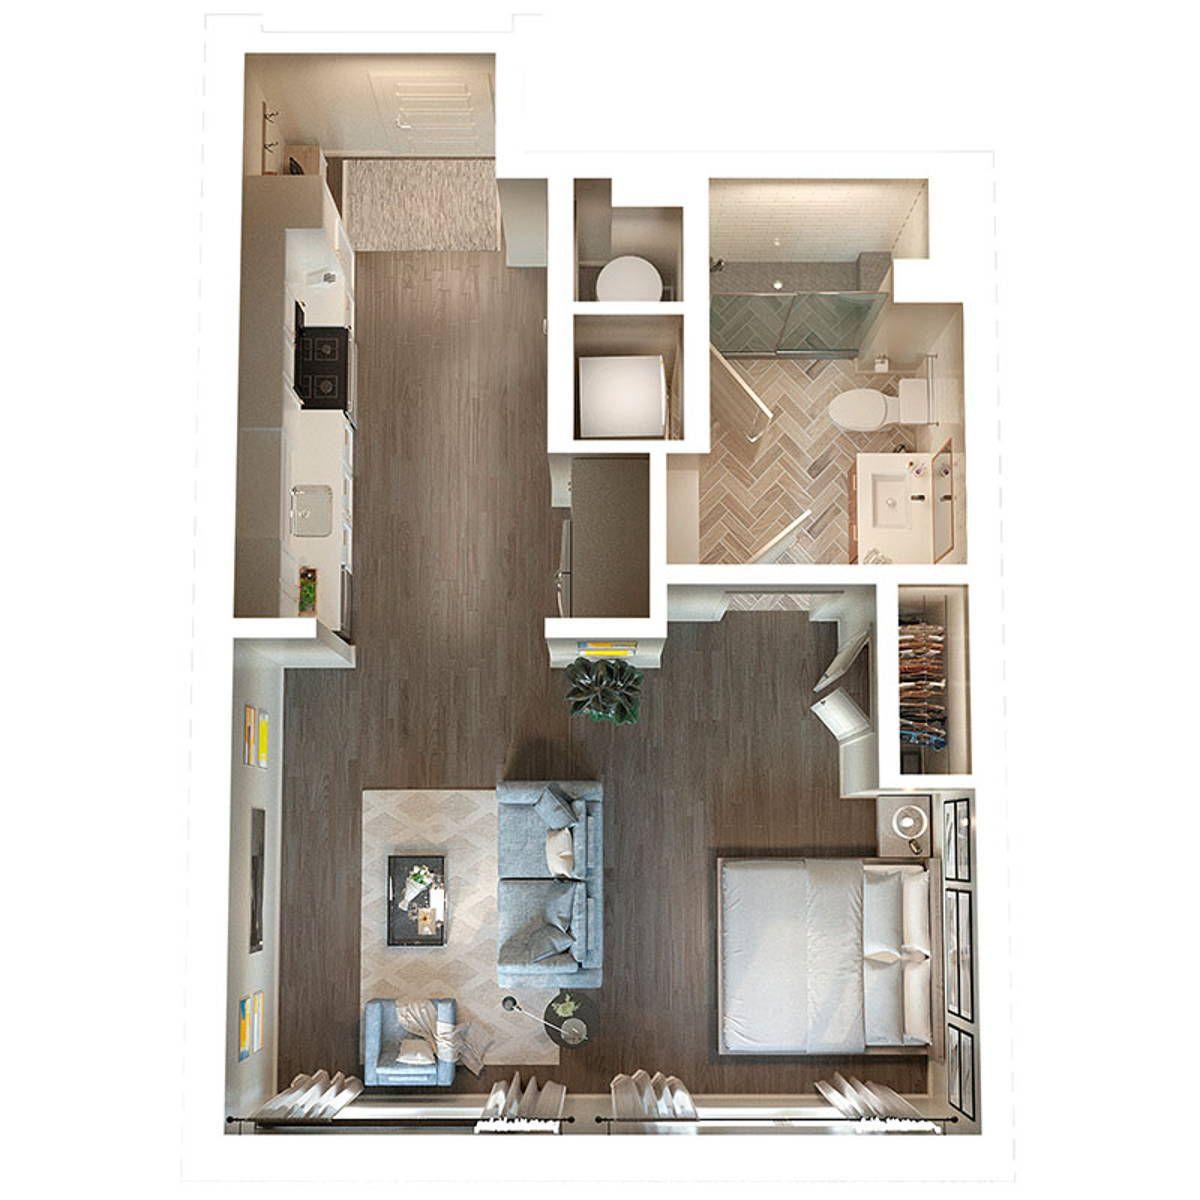 A studio apartment floorplan.